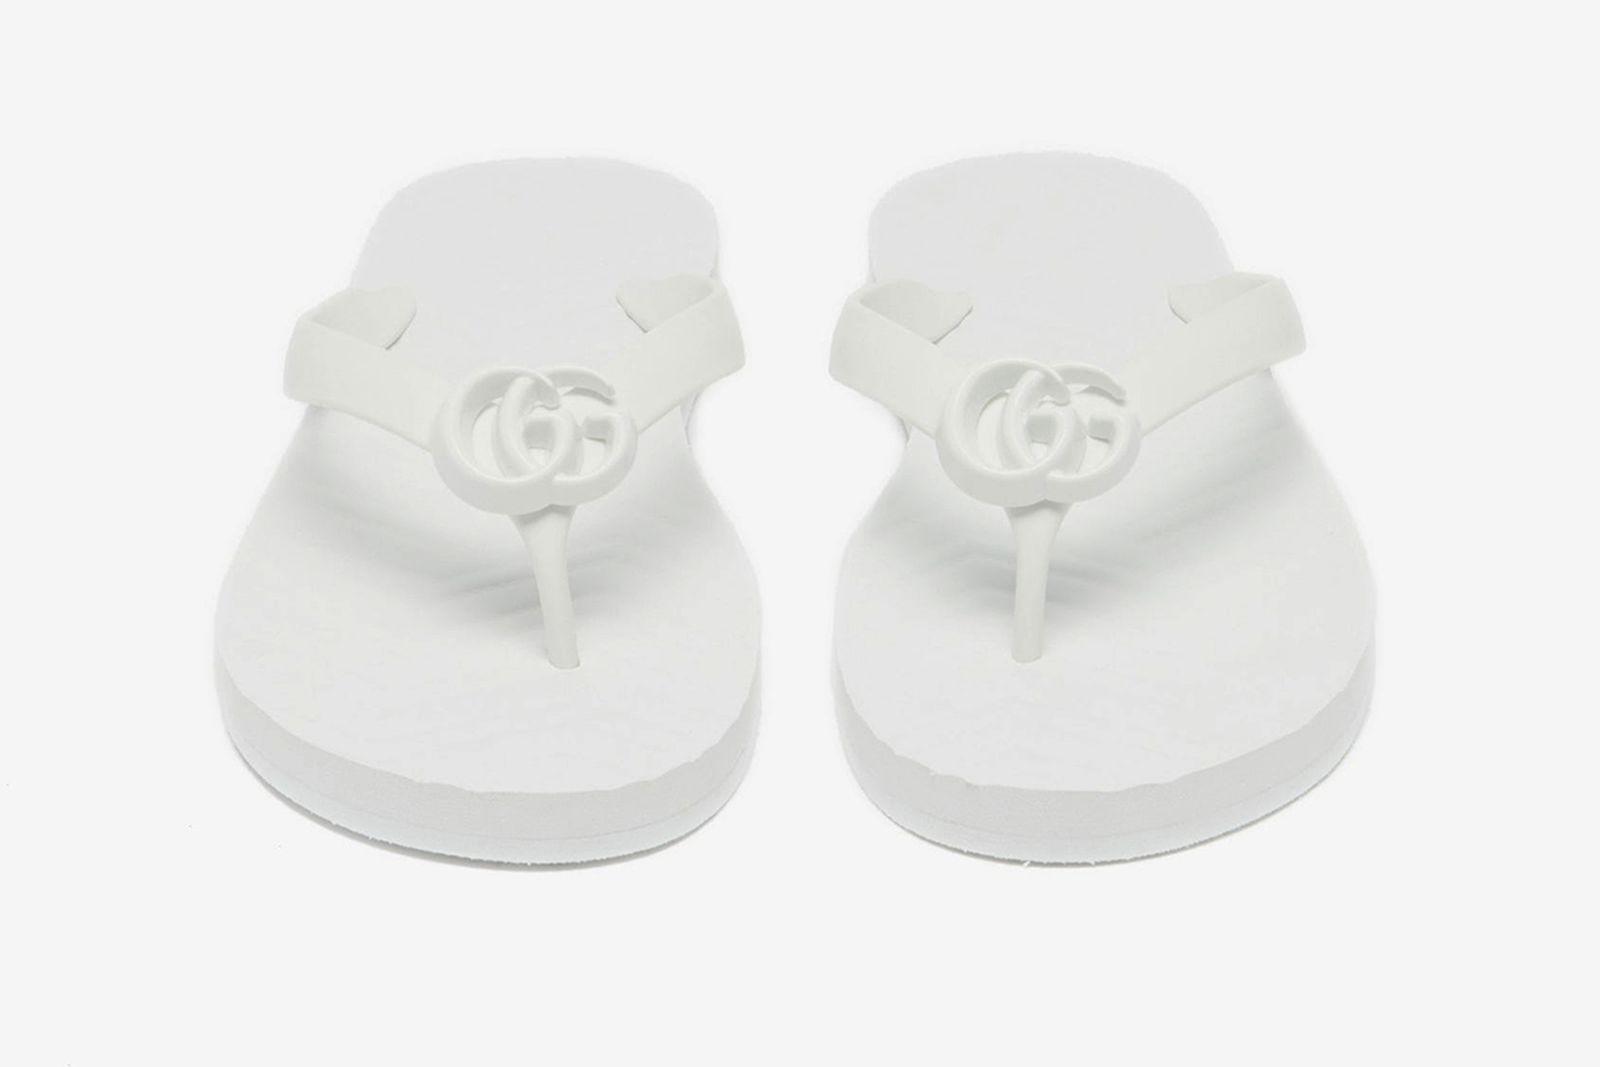 gucci flip flop sandals (4)